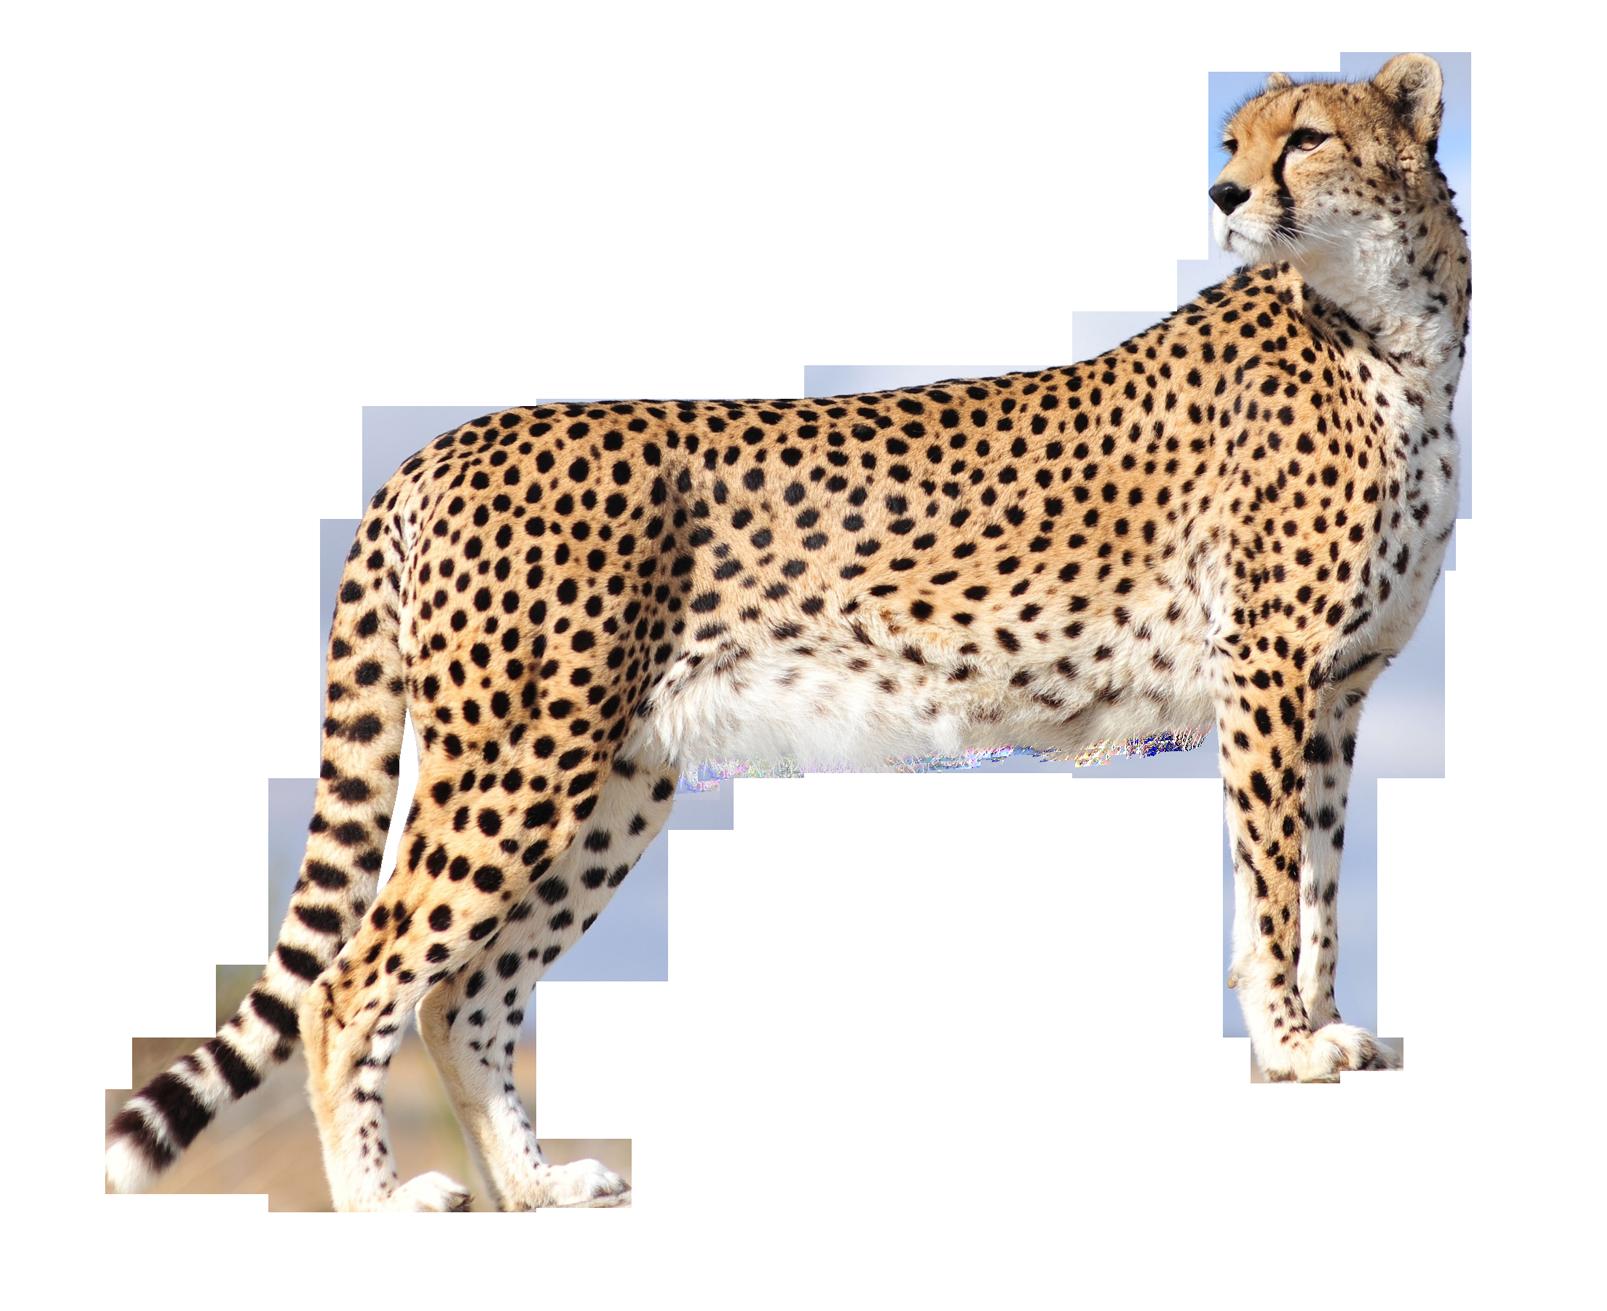 Cheetah book clipart freeuse HQ Cheetah PNG Transparent Cheetah.PNG Images. | PlusPNG freeuse